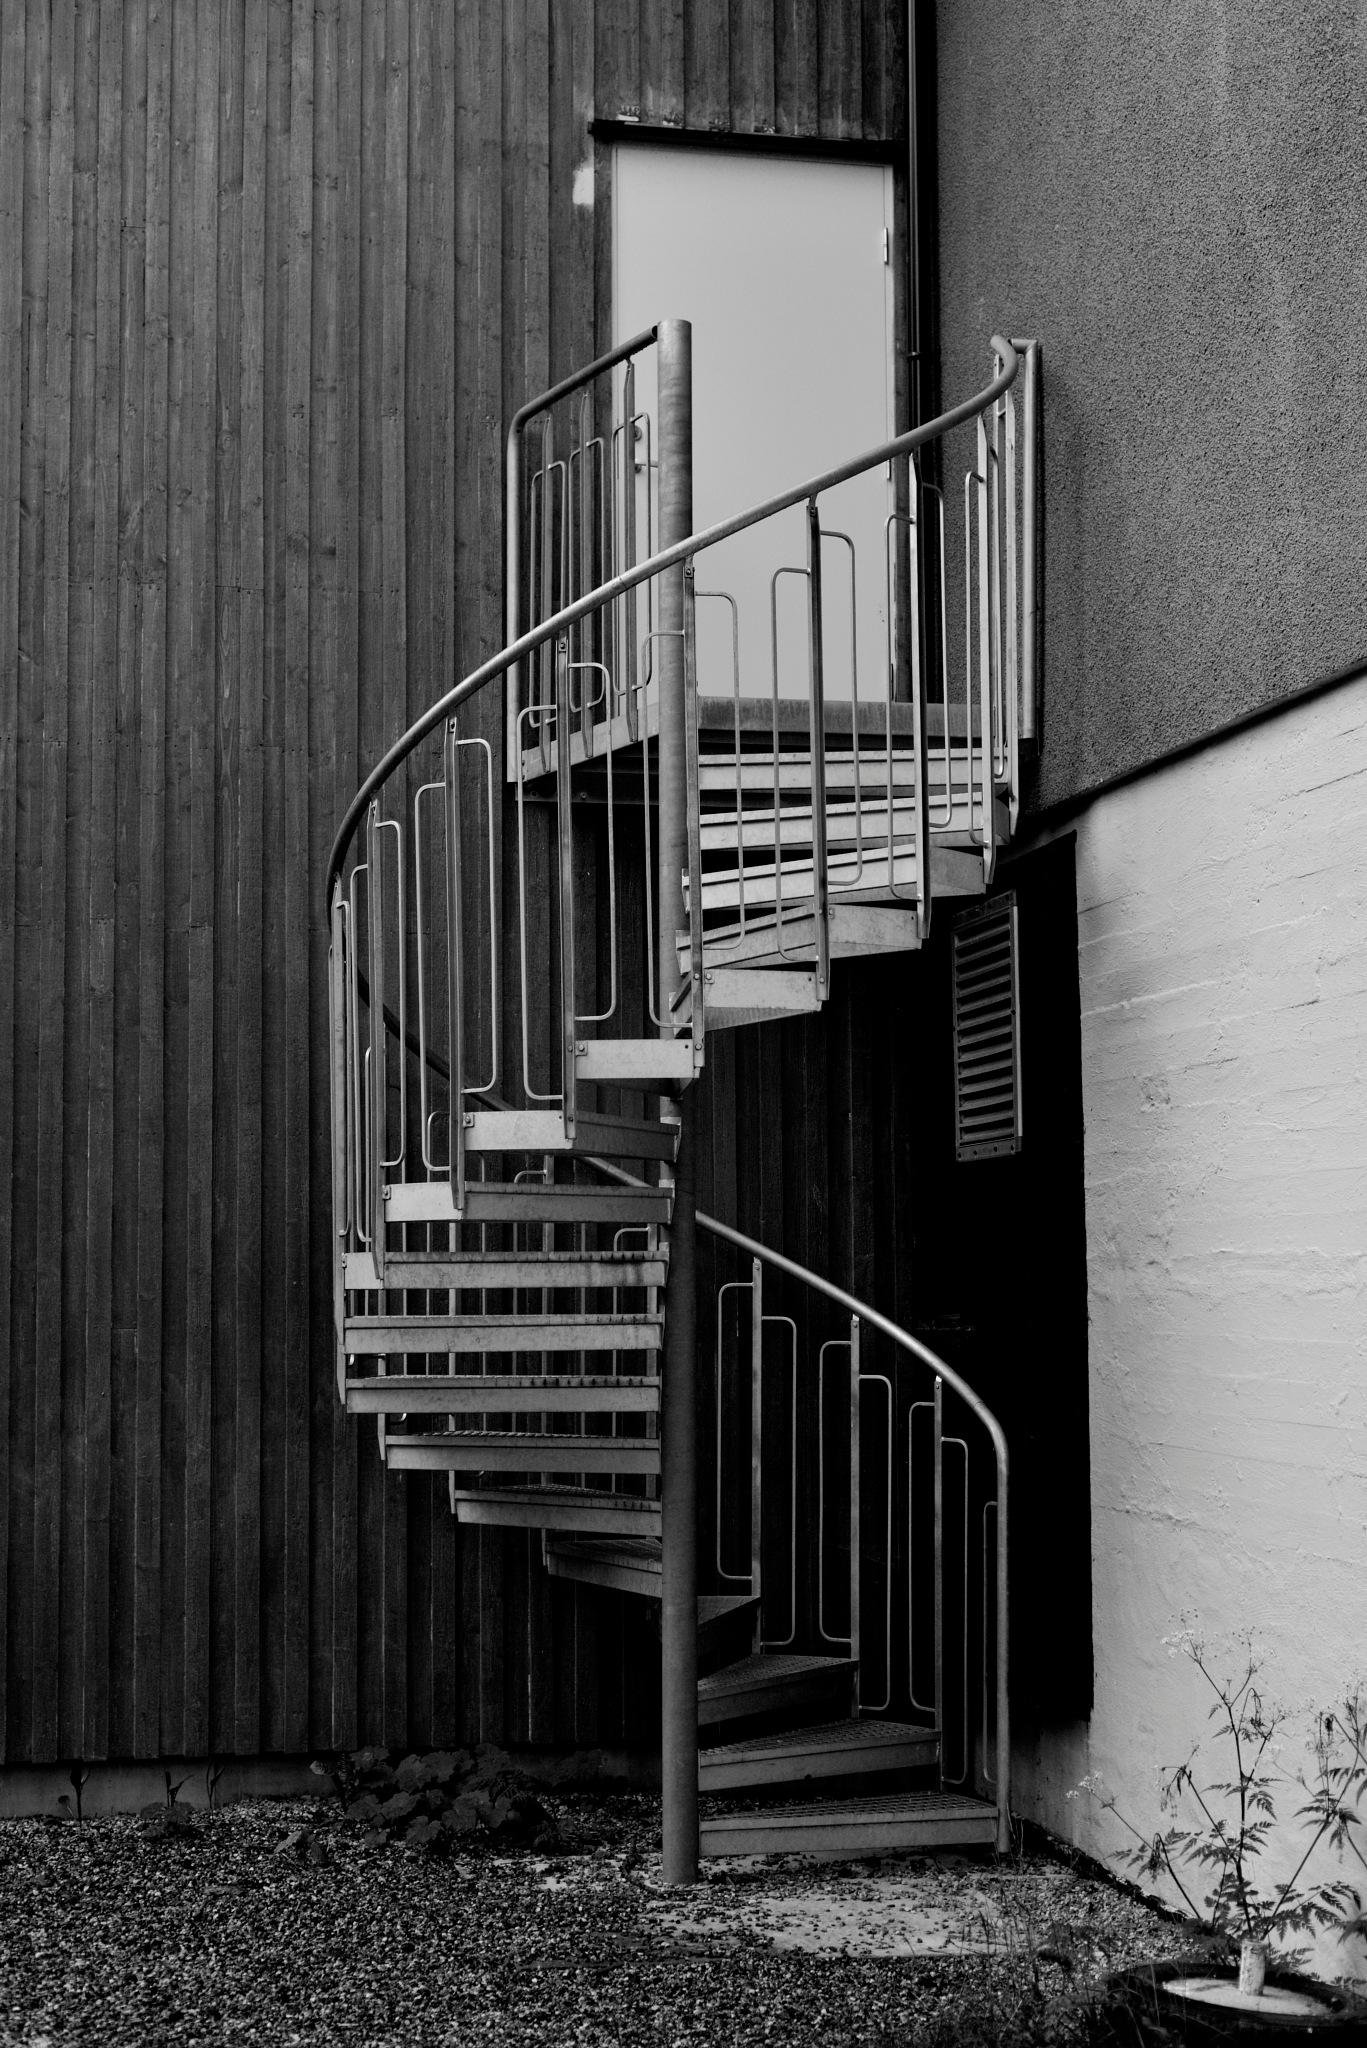 Stairs to Nowhere by Goran Jorganovich